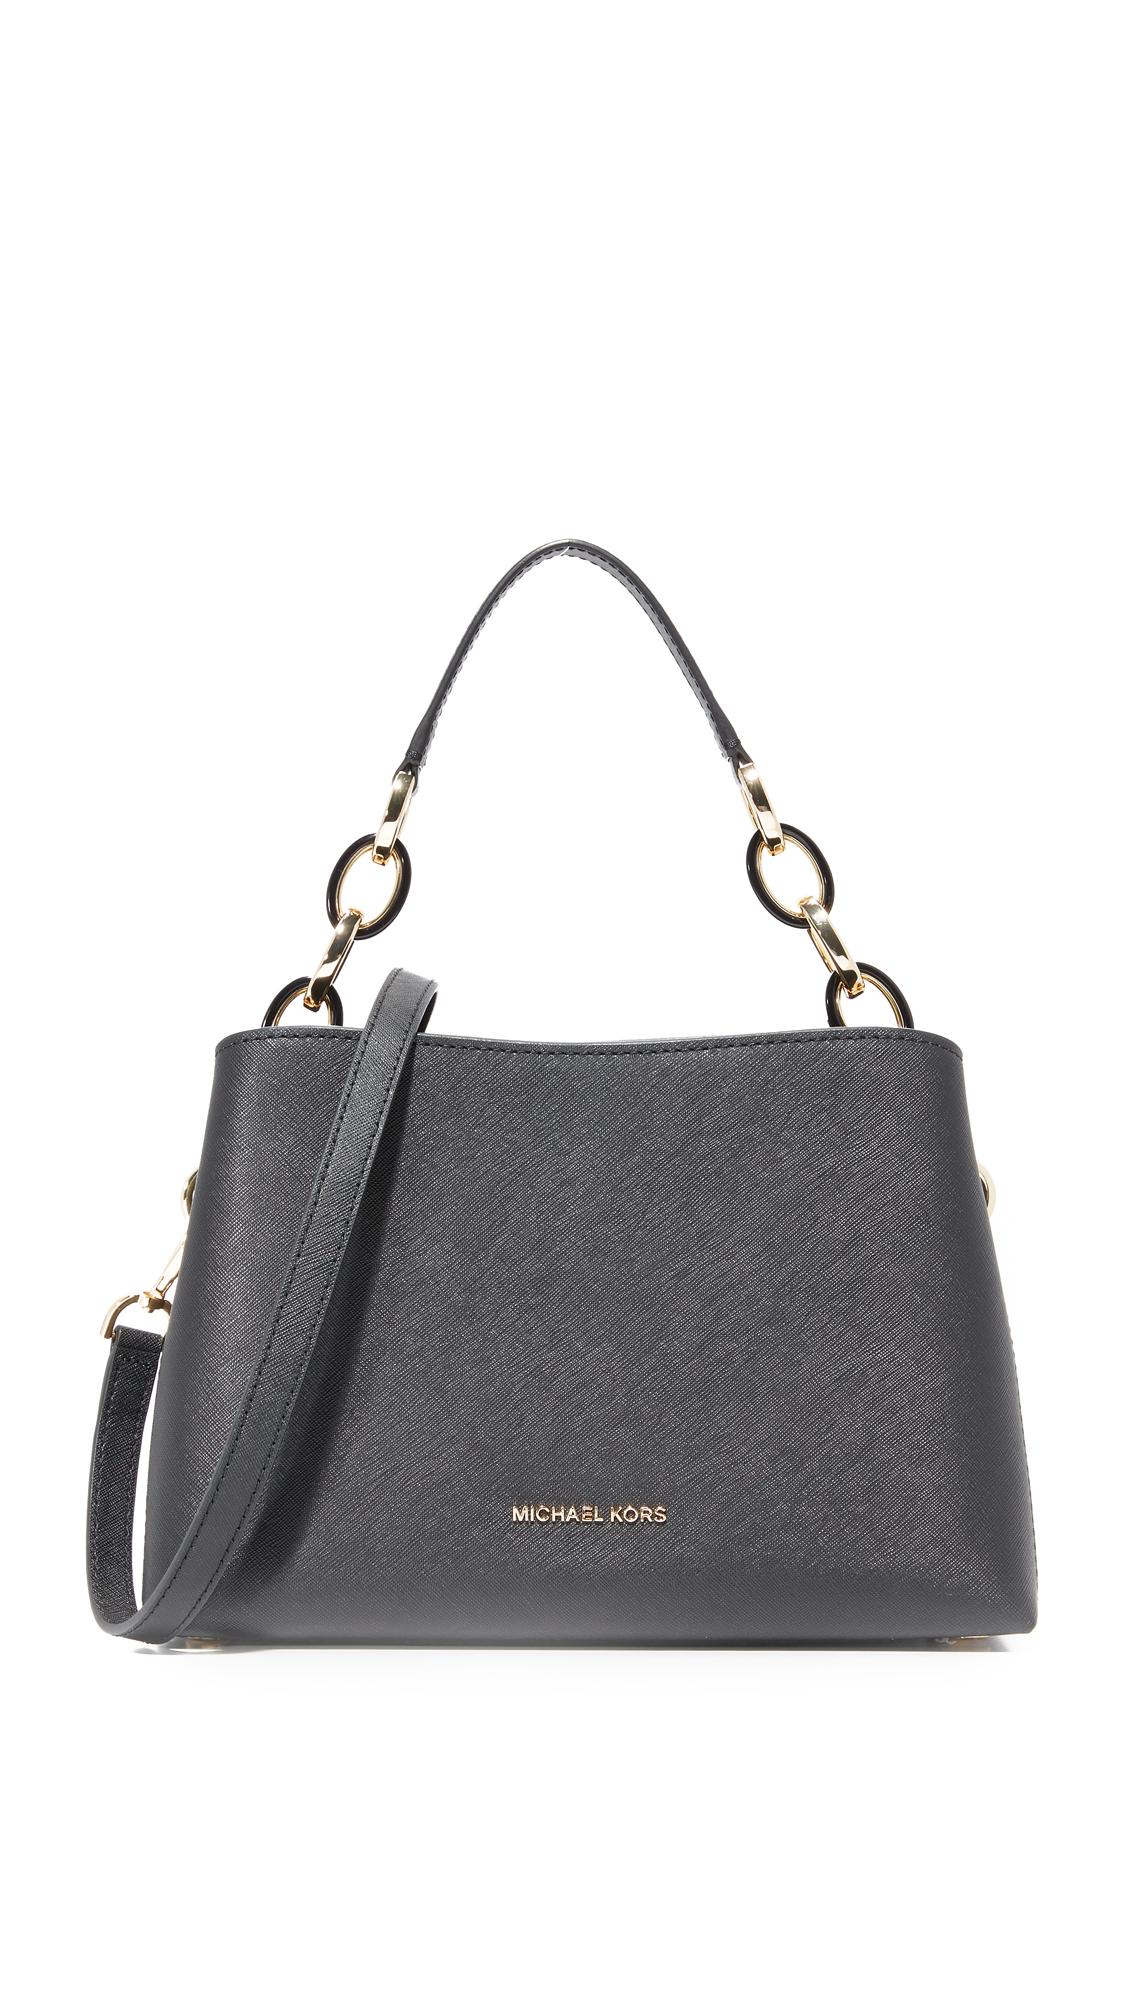 michael kors shopbop mk handbags new